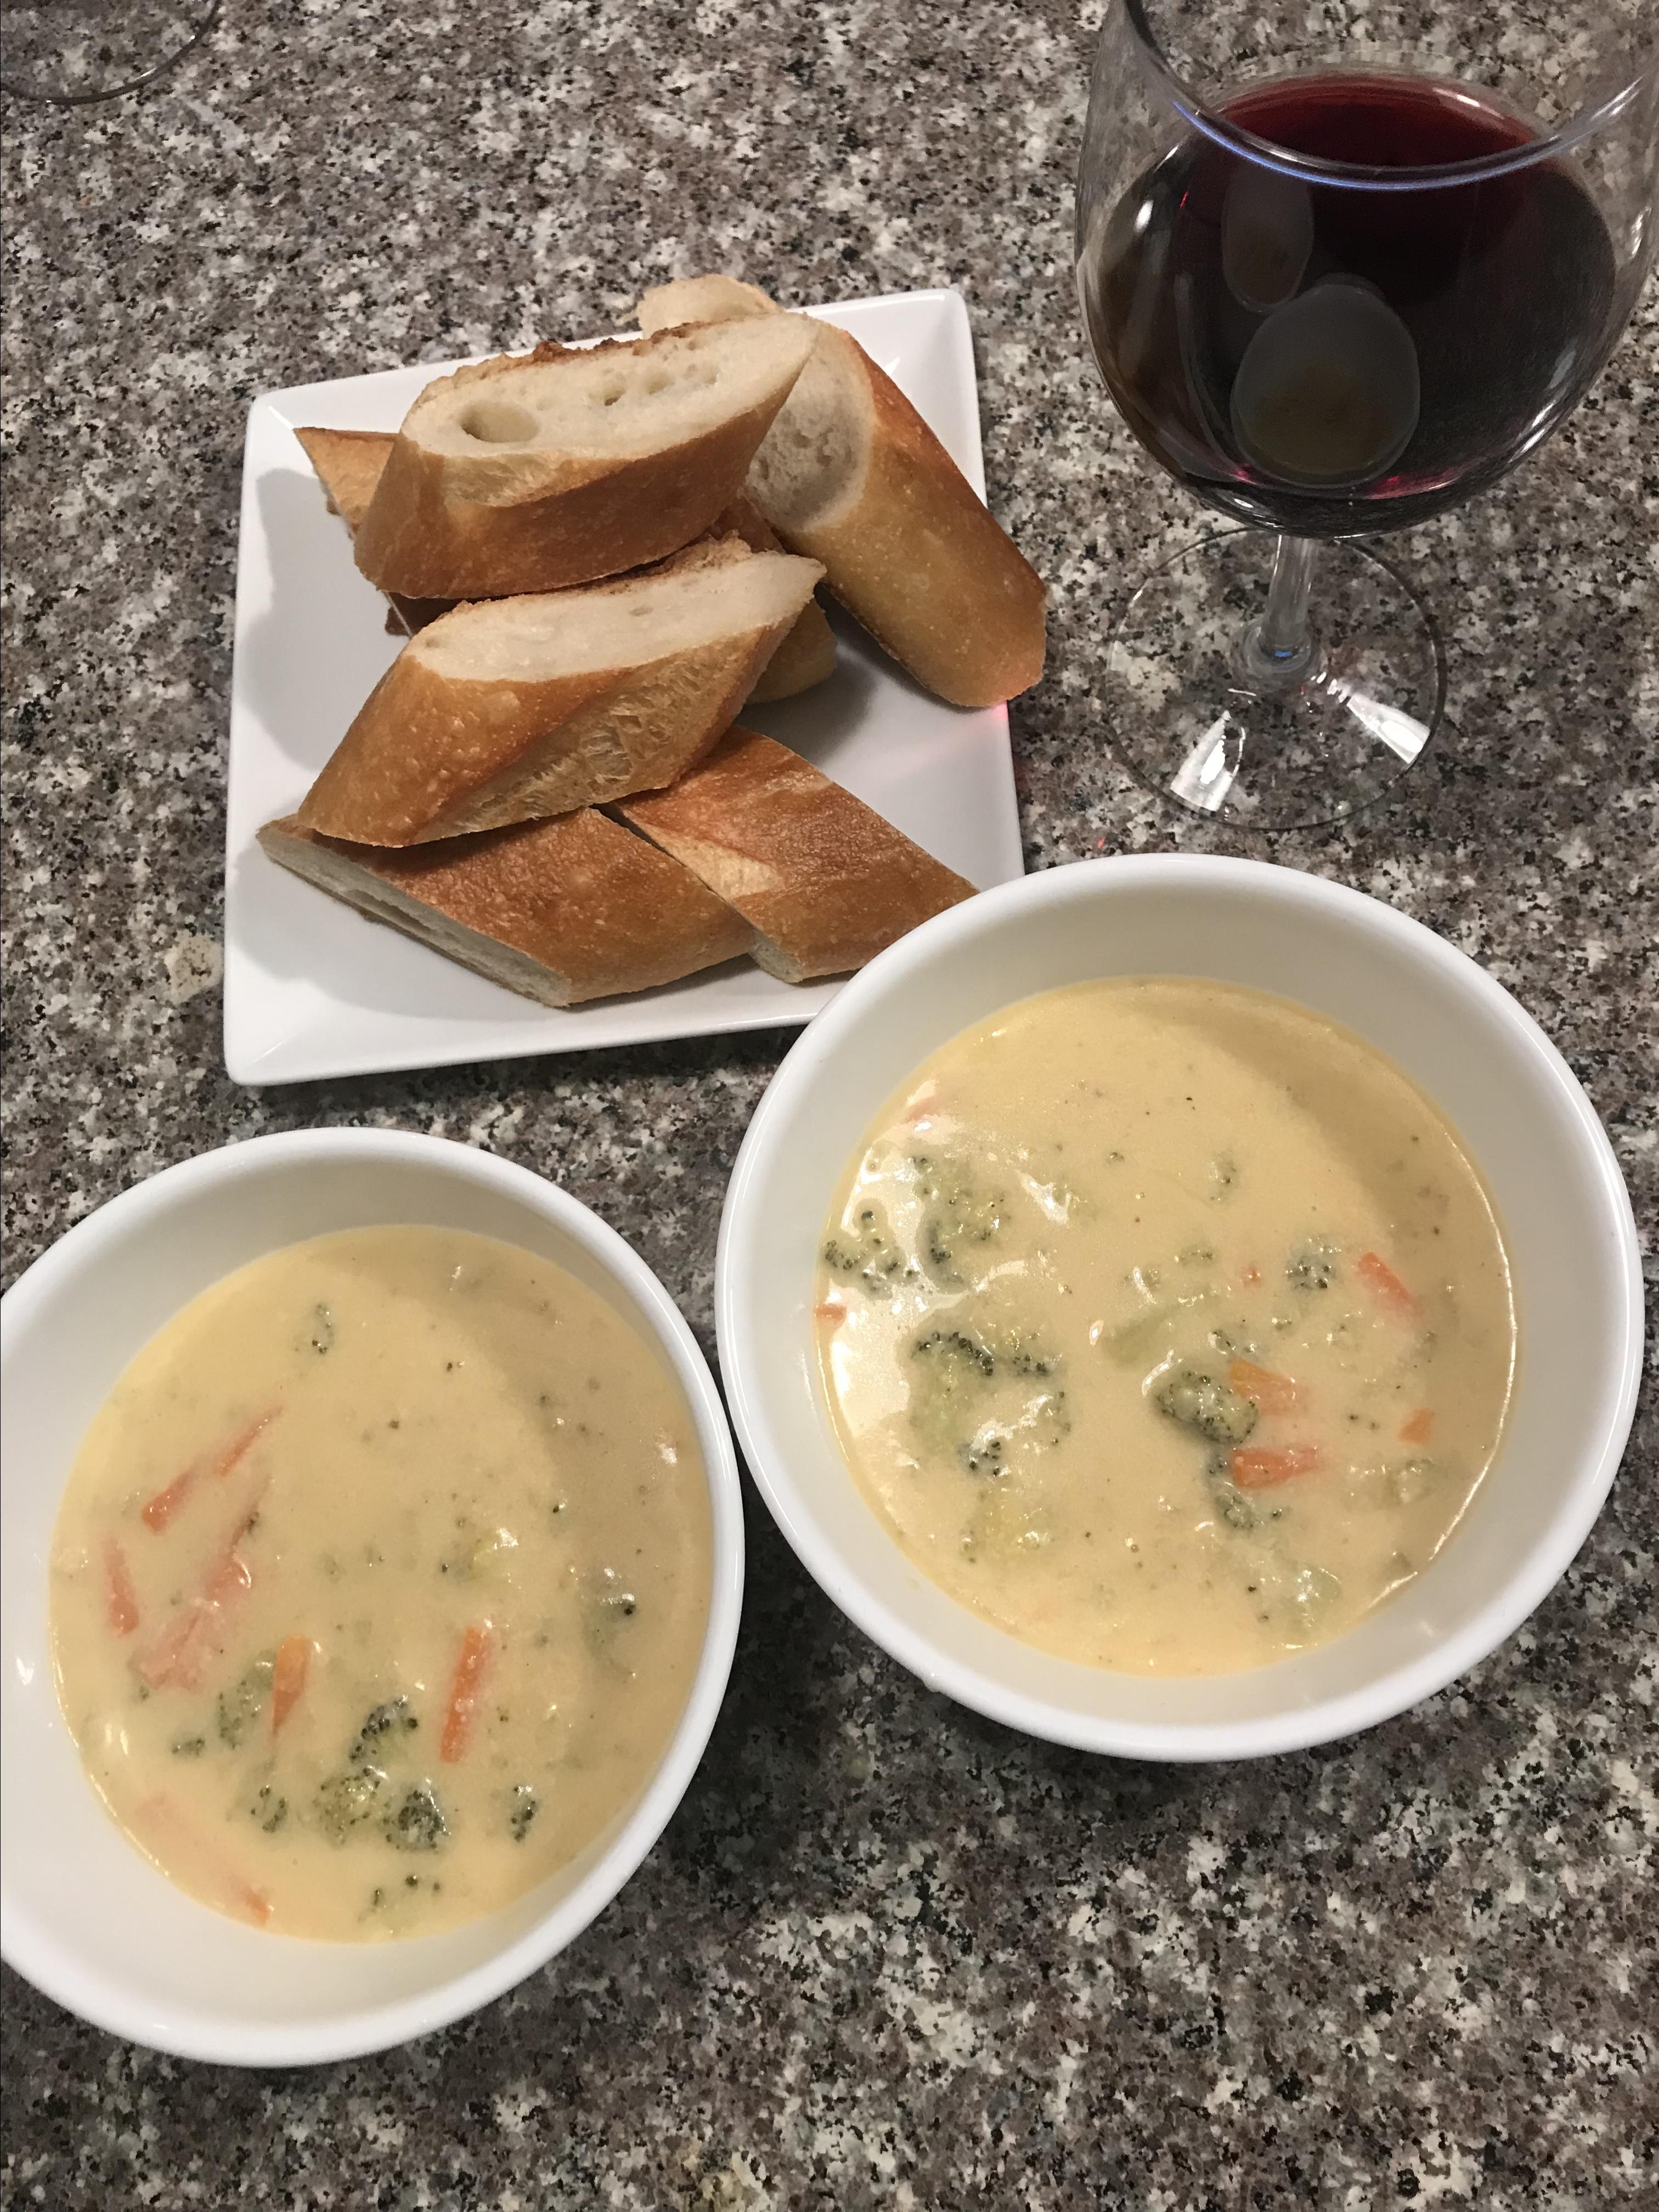 Copycat Panera(R) Broccoli Cheddar Soup